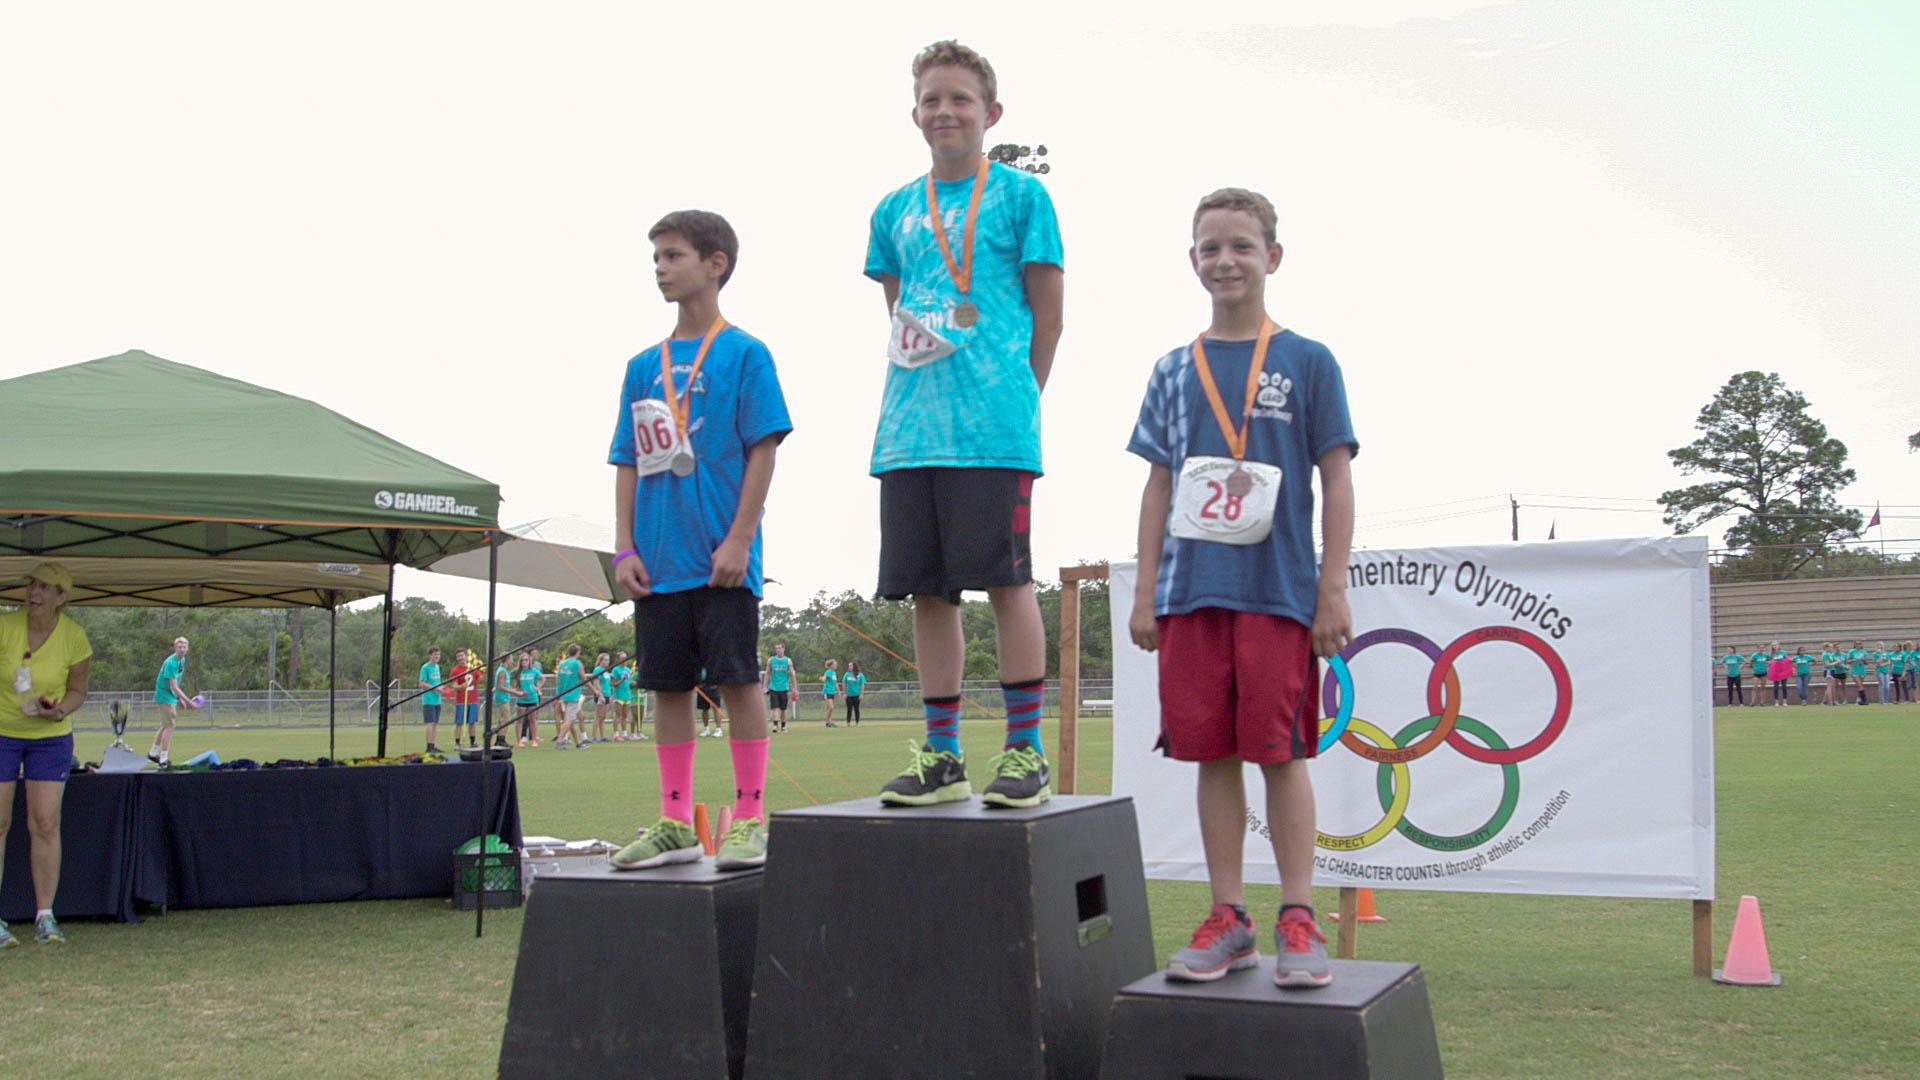 Inaugural Elementary Olympics 2015